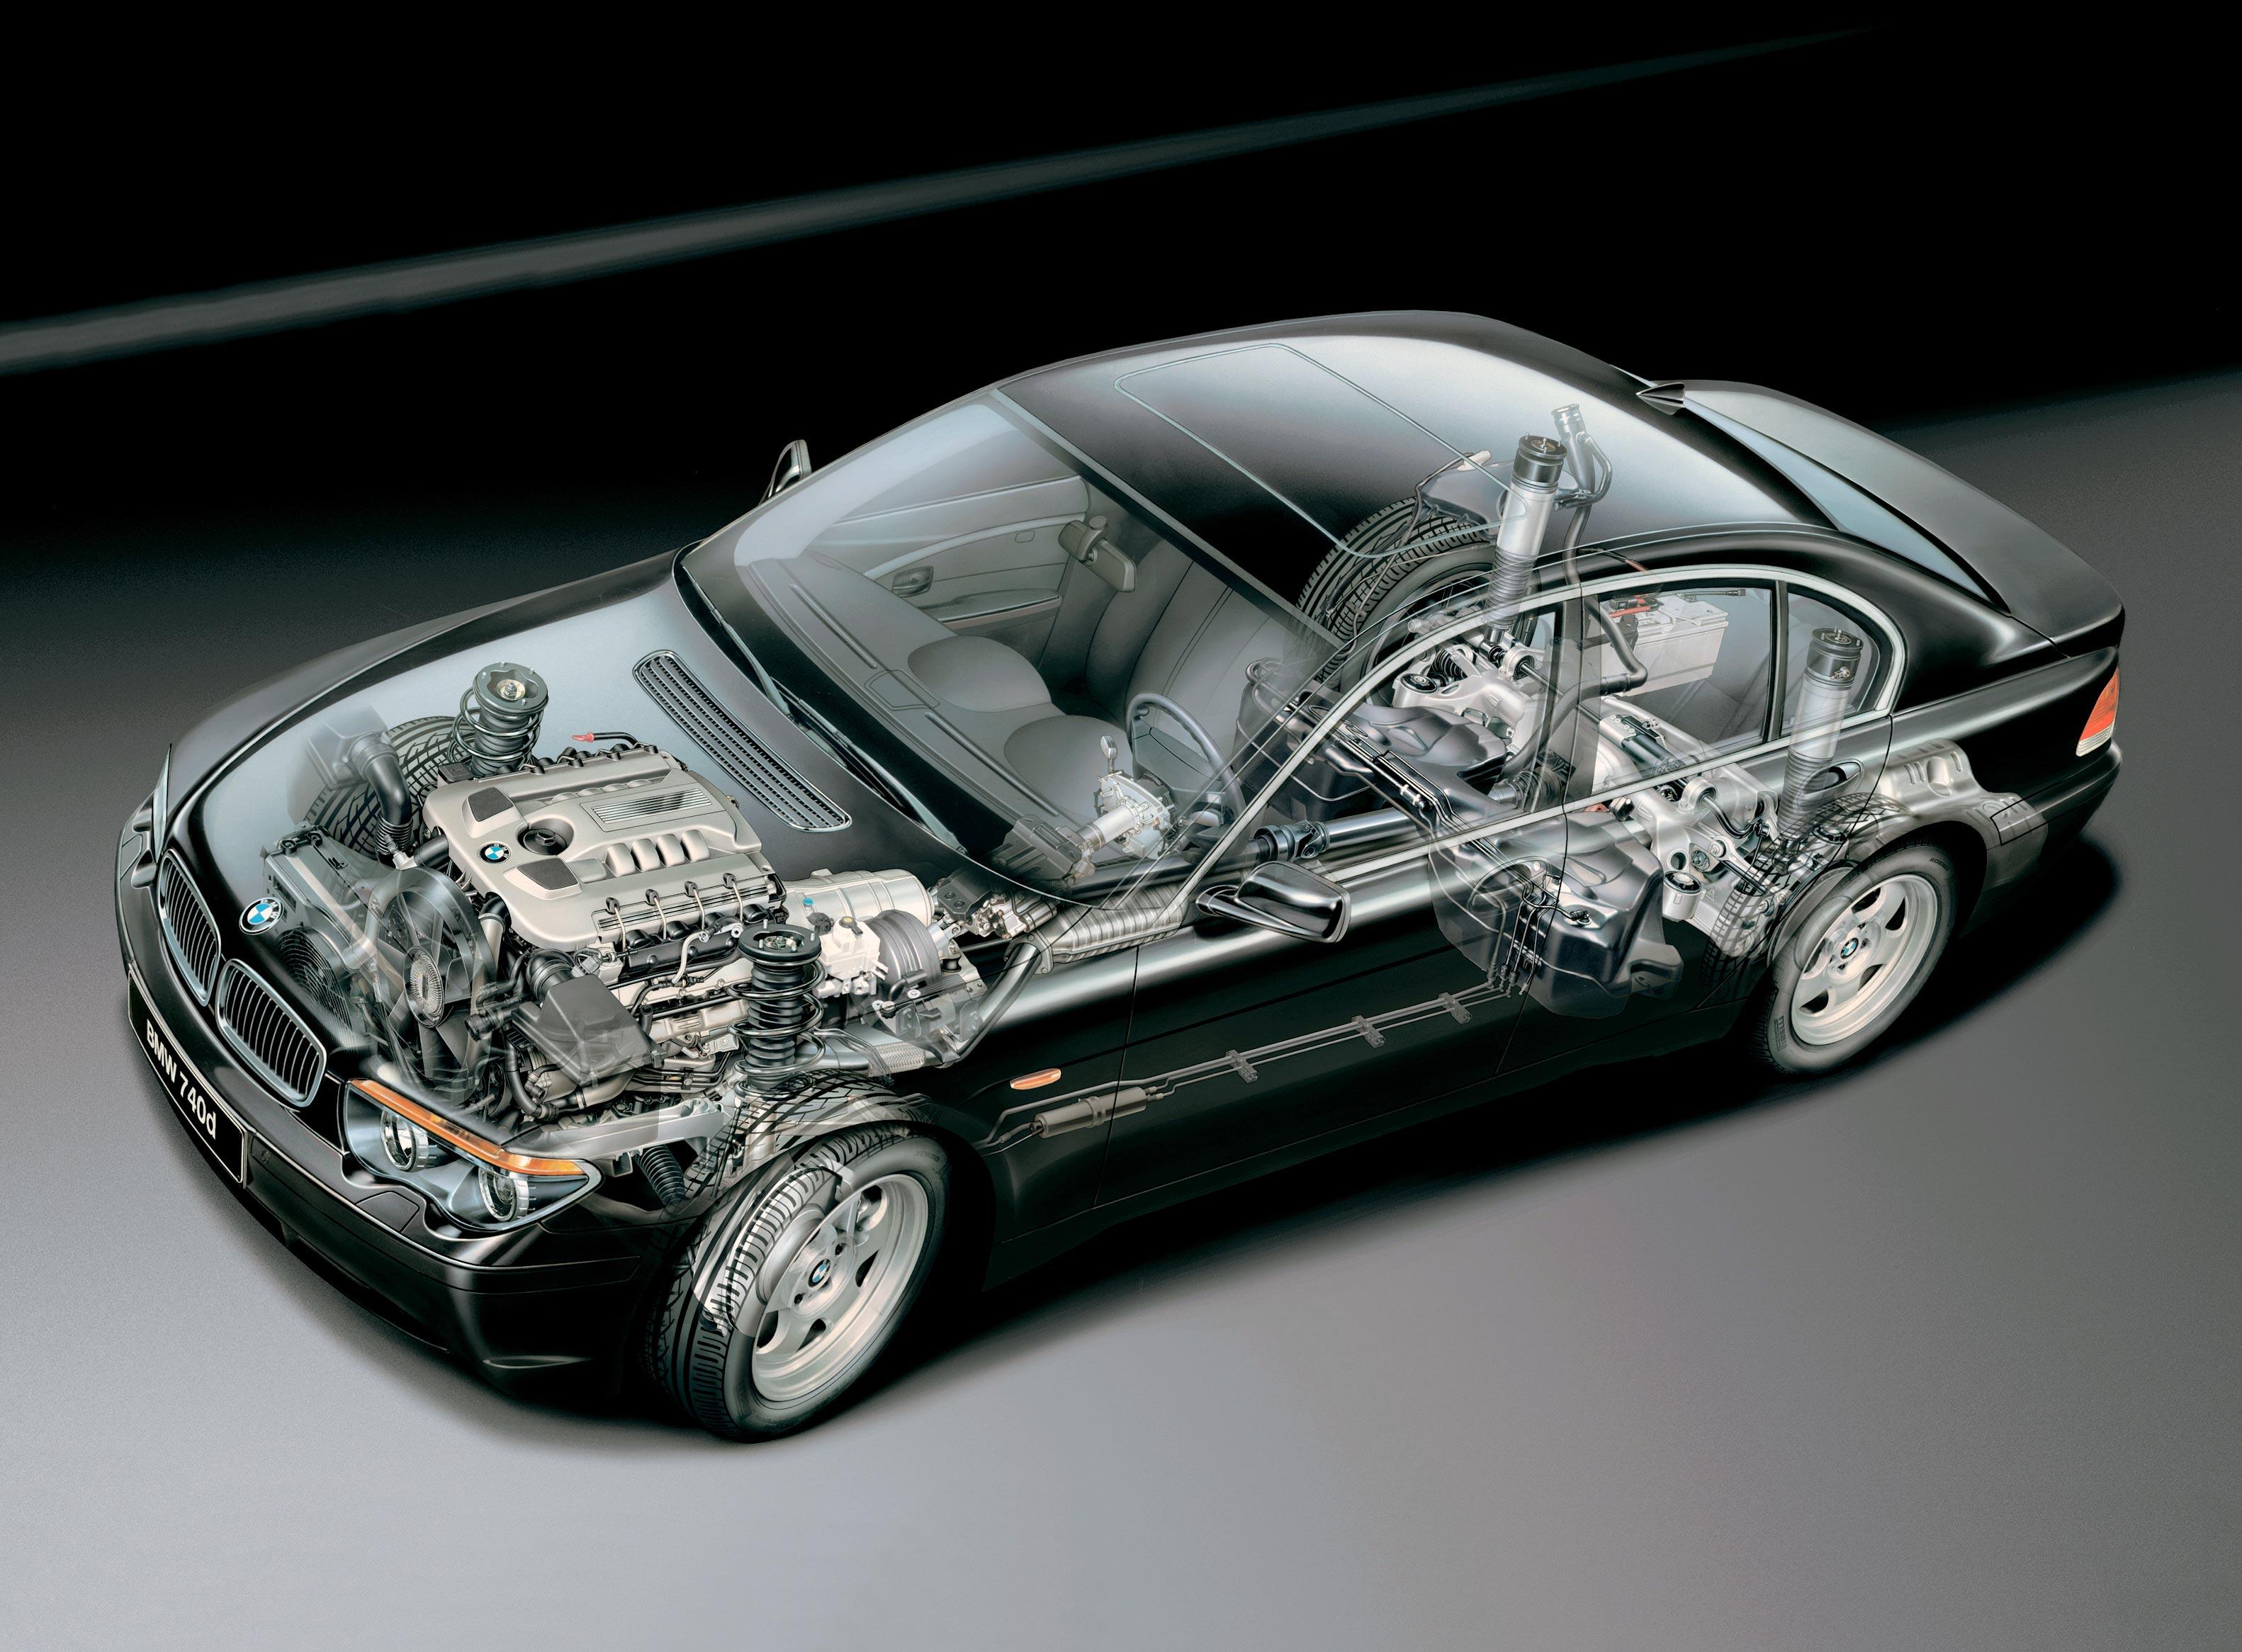 BMW 7 Series E65 2002 cutaway drawing